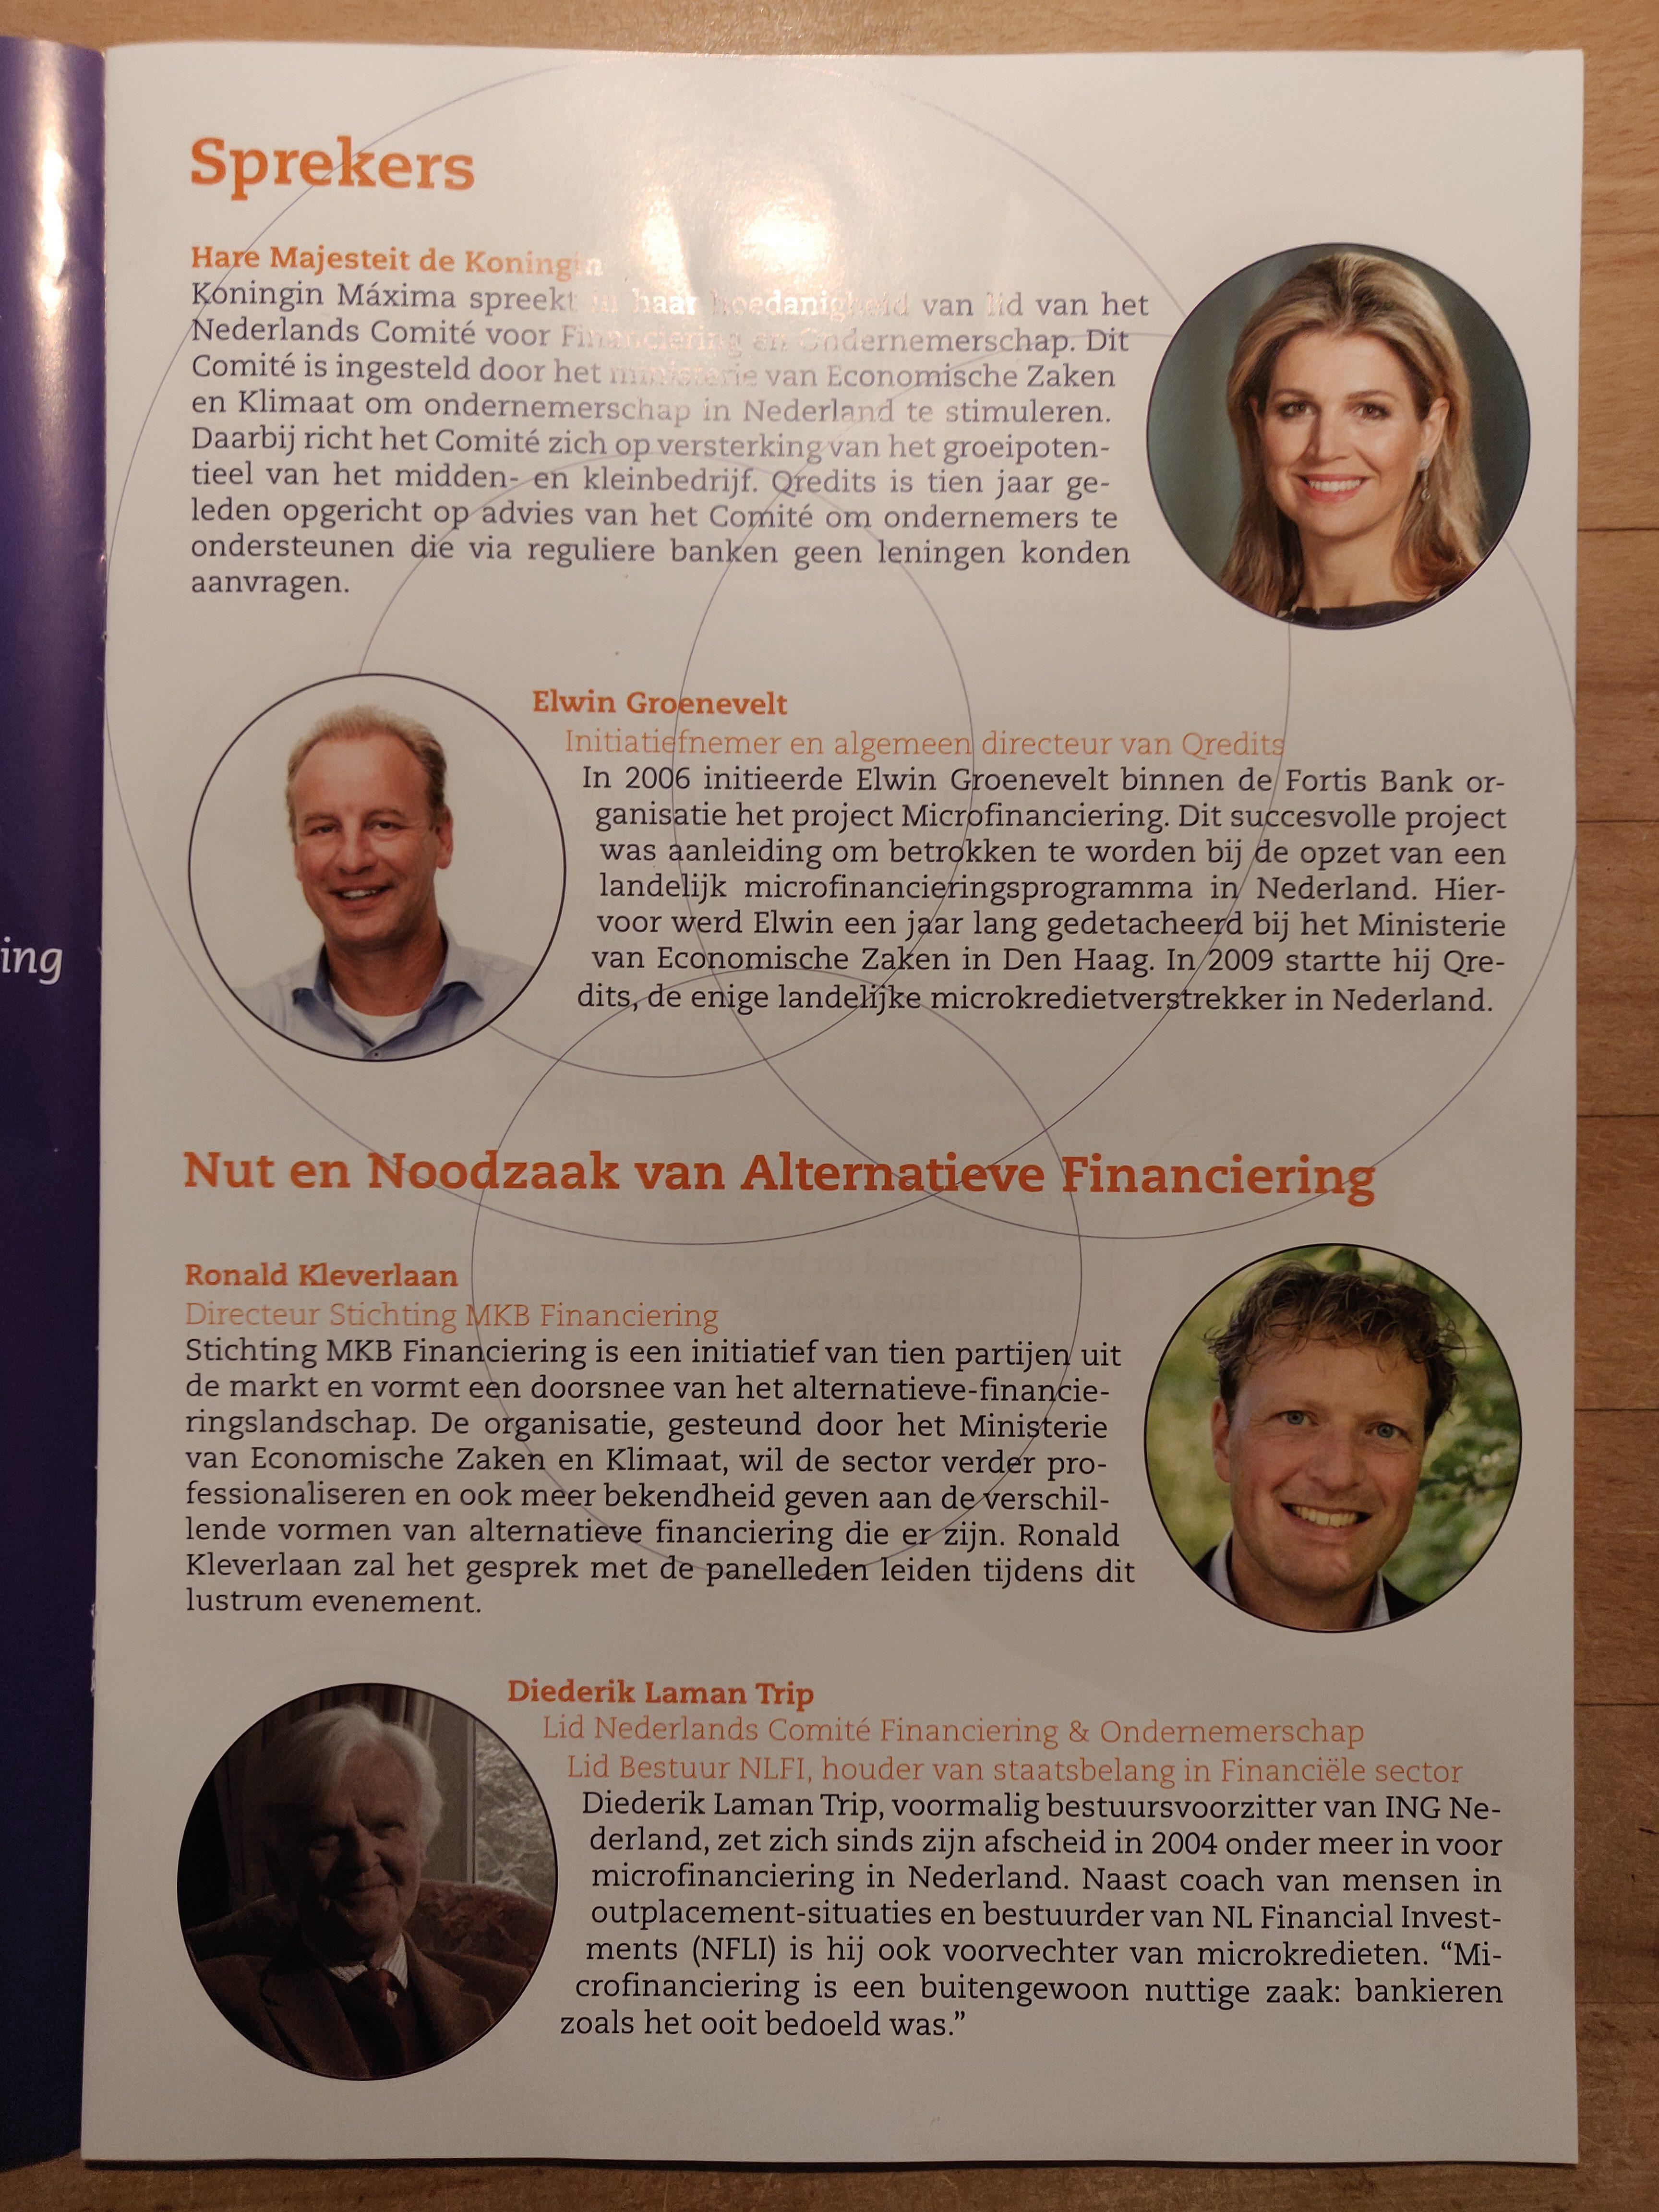 Ronald Kleverlaan sprak namens SMF tijdens 10 jarig jubileum van kredietverstrekker voor ondernemers